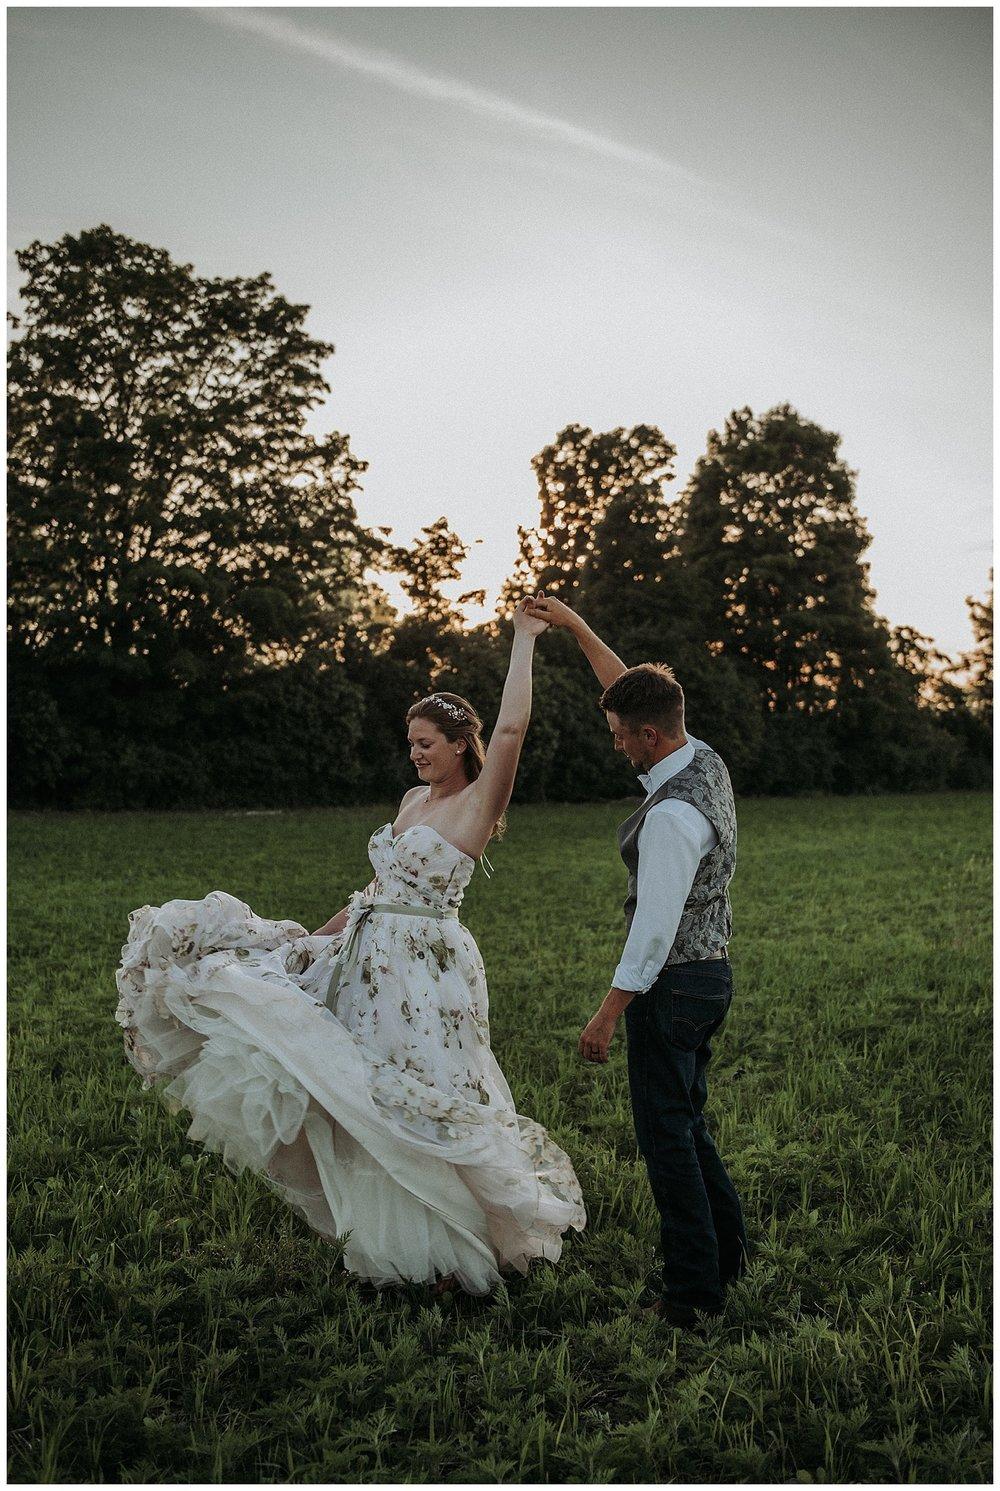 backyardwedding_Holly-McMurter-Photographs.jpg